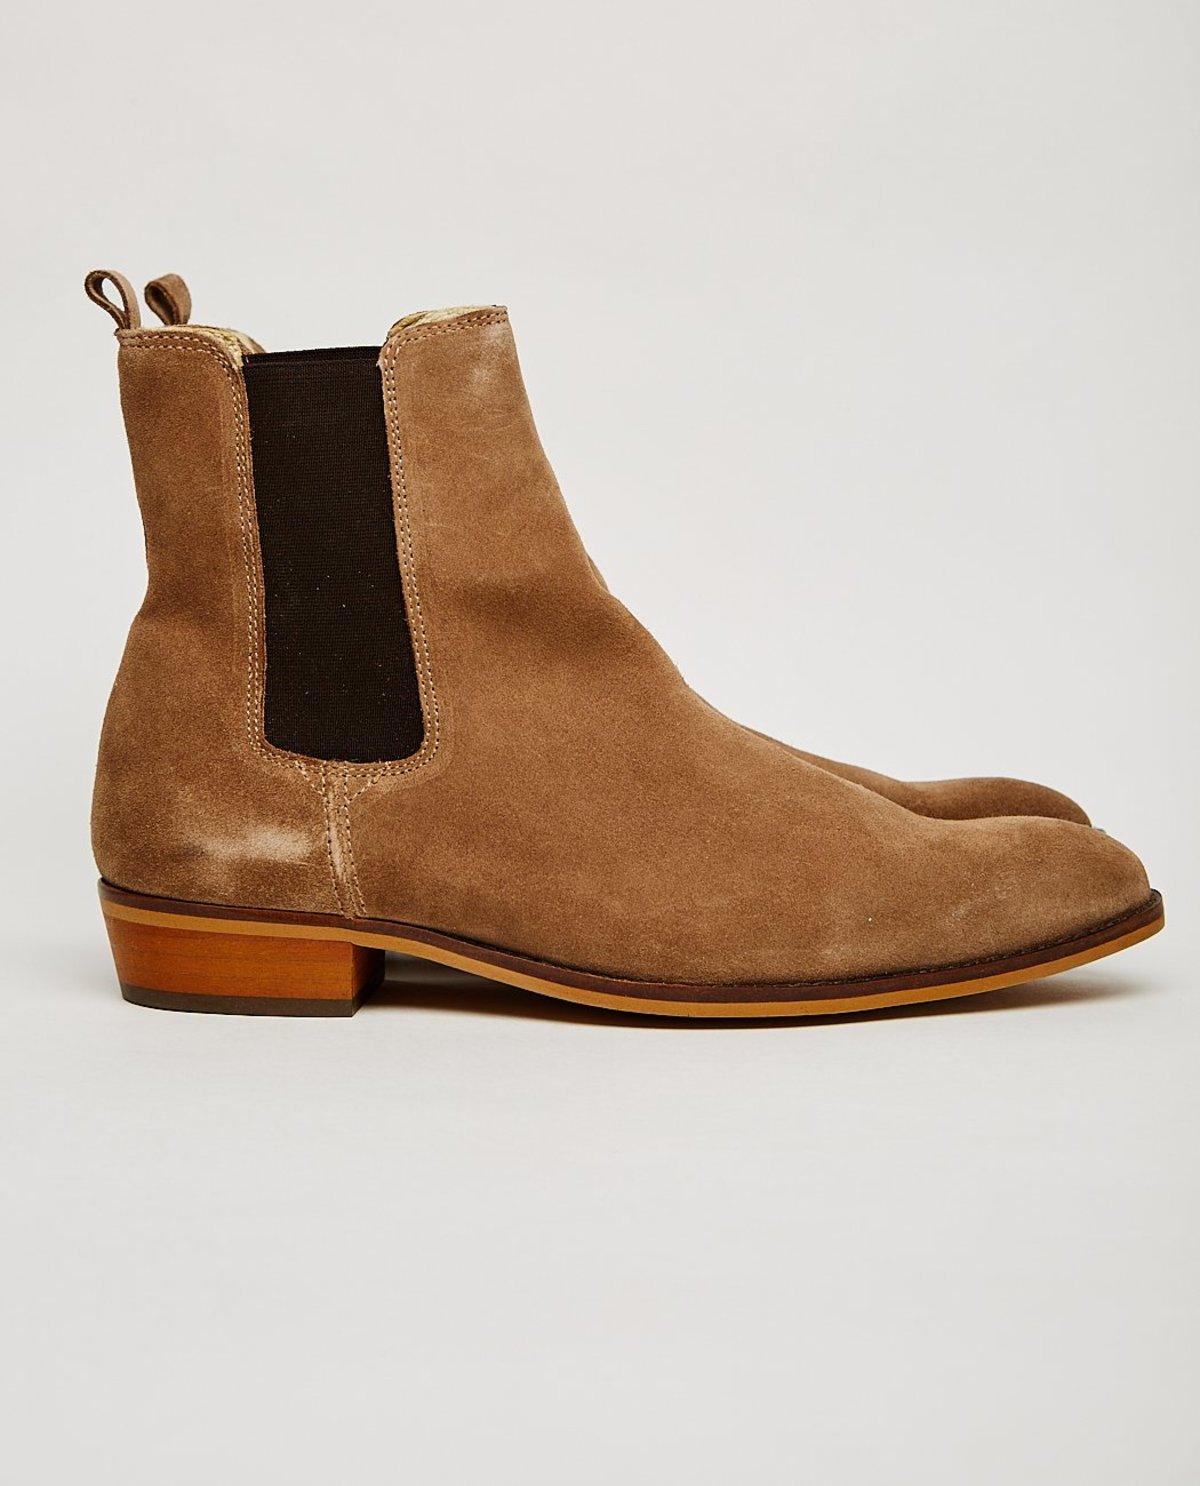 Shoe the Bear ELI CHELSEA BOOT - brown